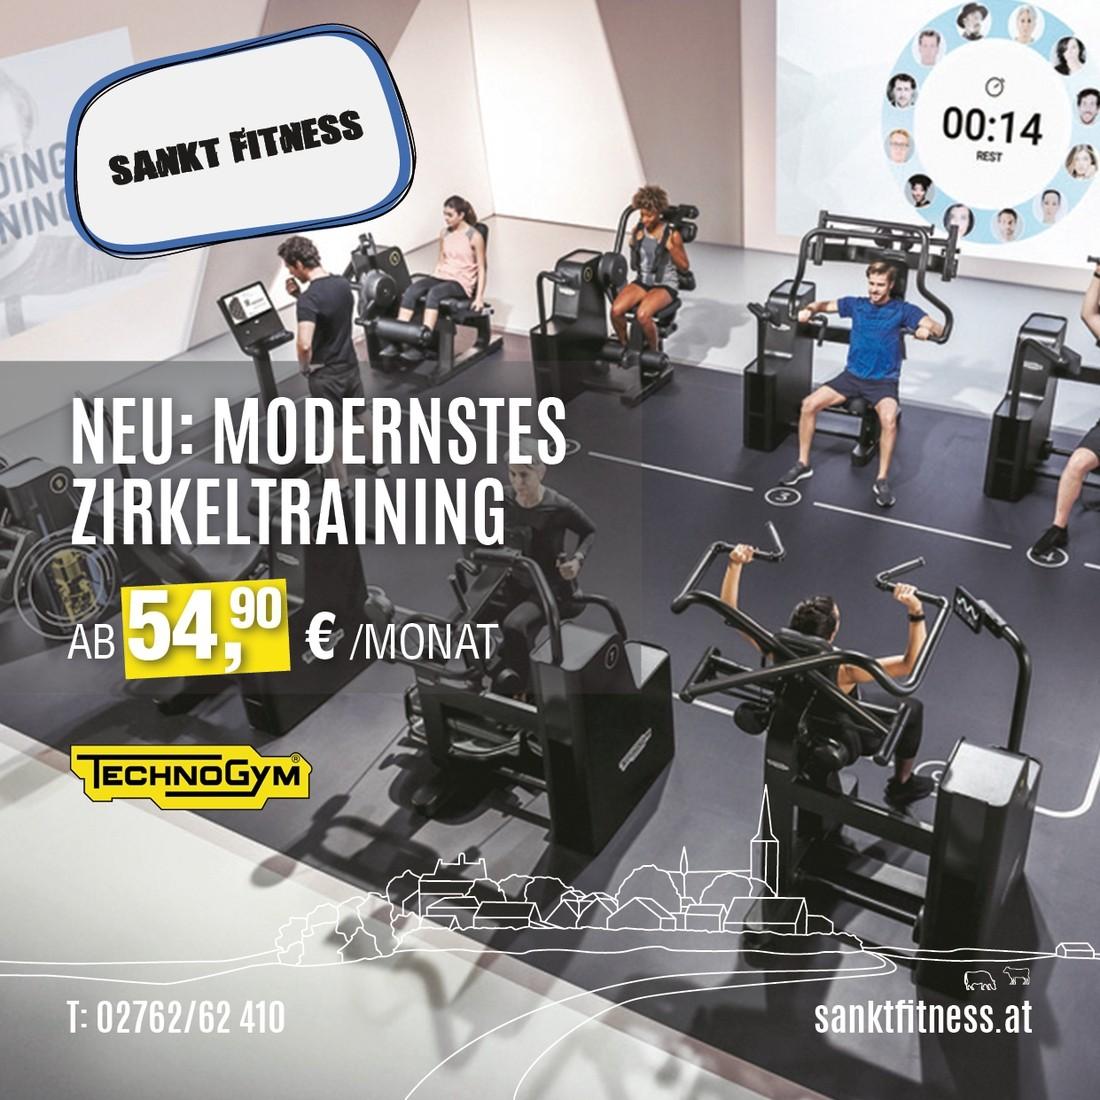 Neu: Modernstes Zirkeltraining. Ab 54,90 €/Monat. (TechnoGym)